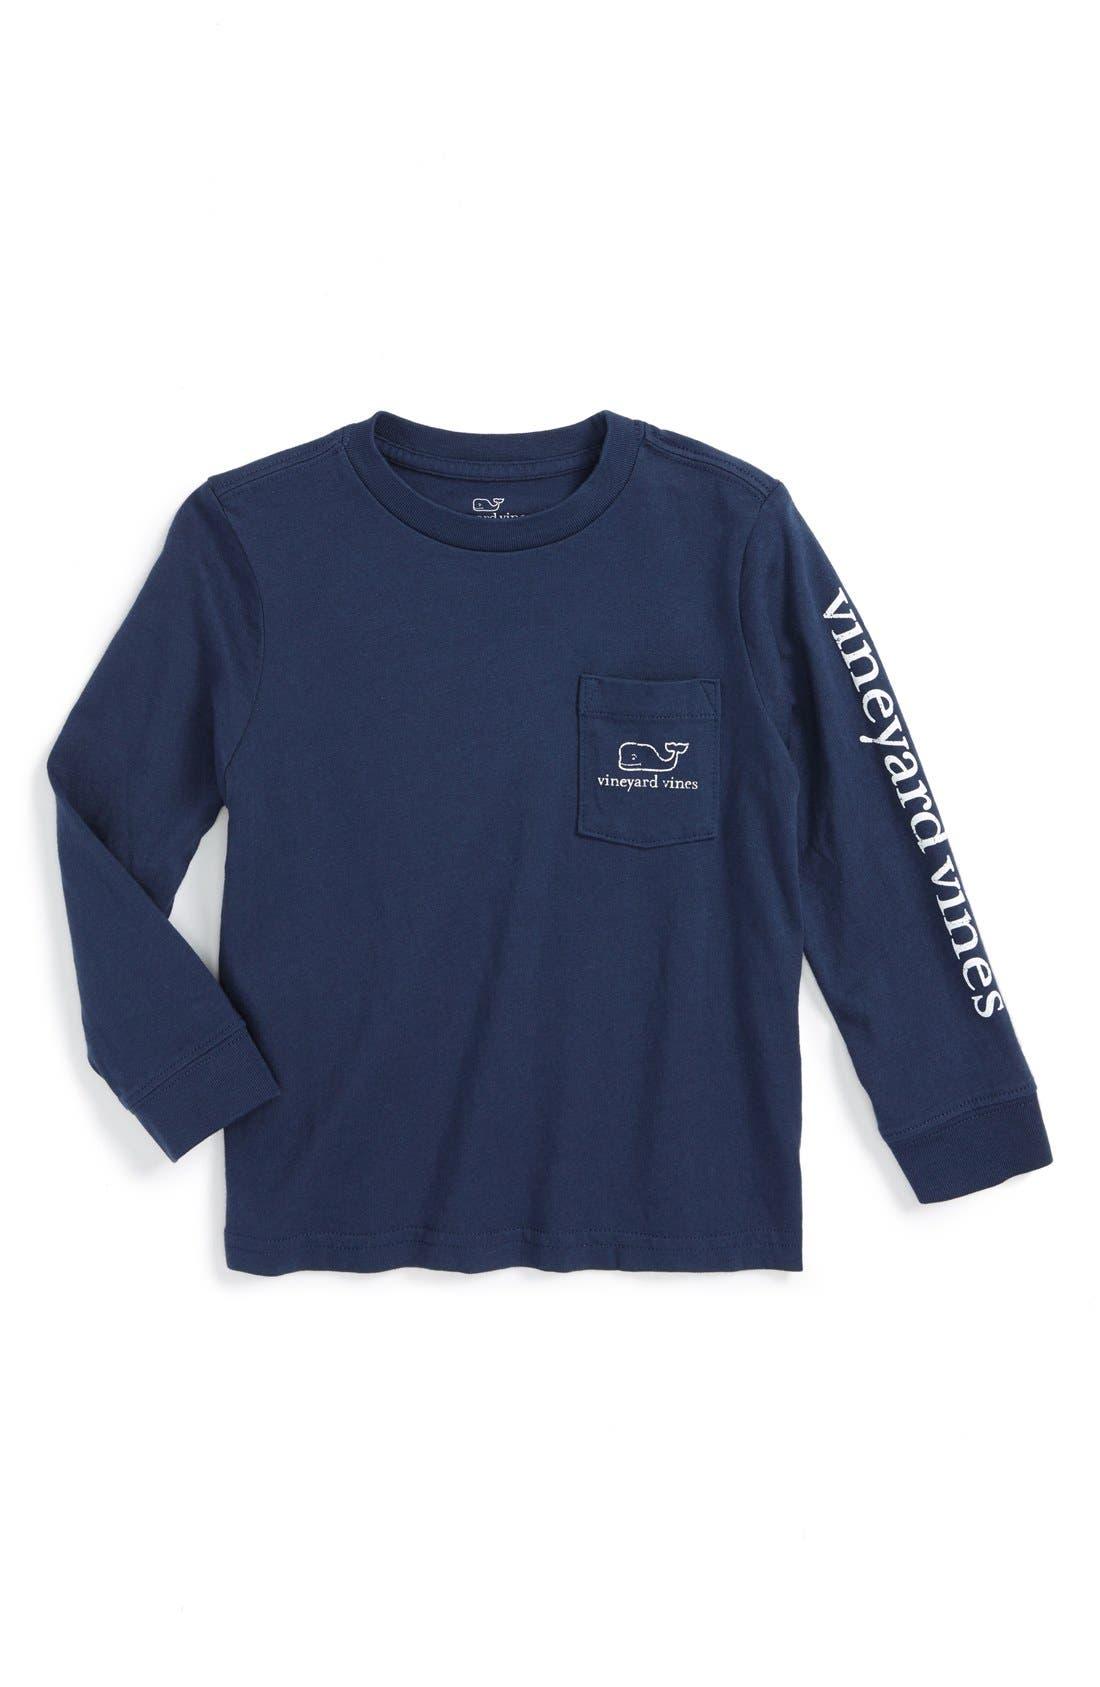 Main Image - vineyard vines Vintage Whale Graphic Long Sleeve T-Shirt (Toddler Boys & Little Boys)